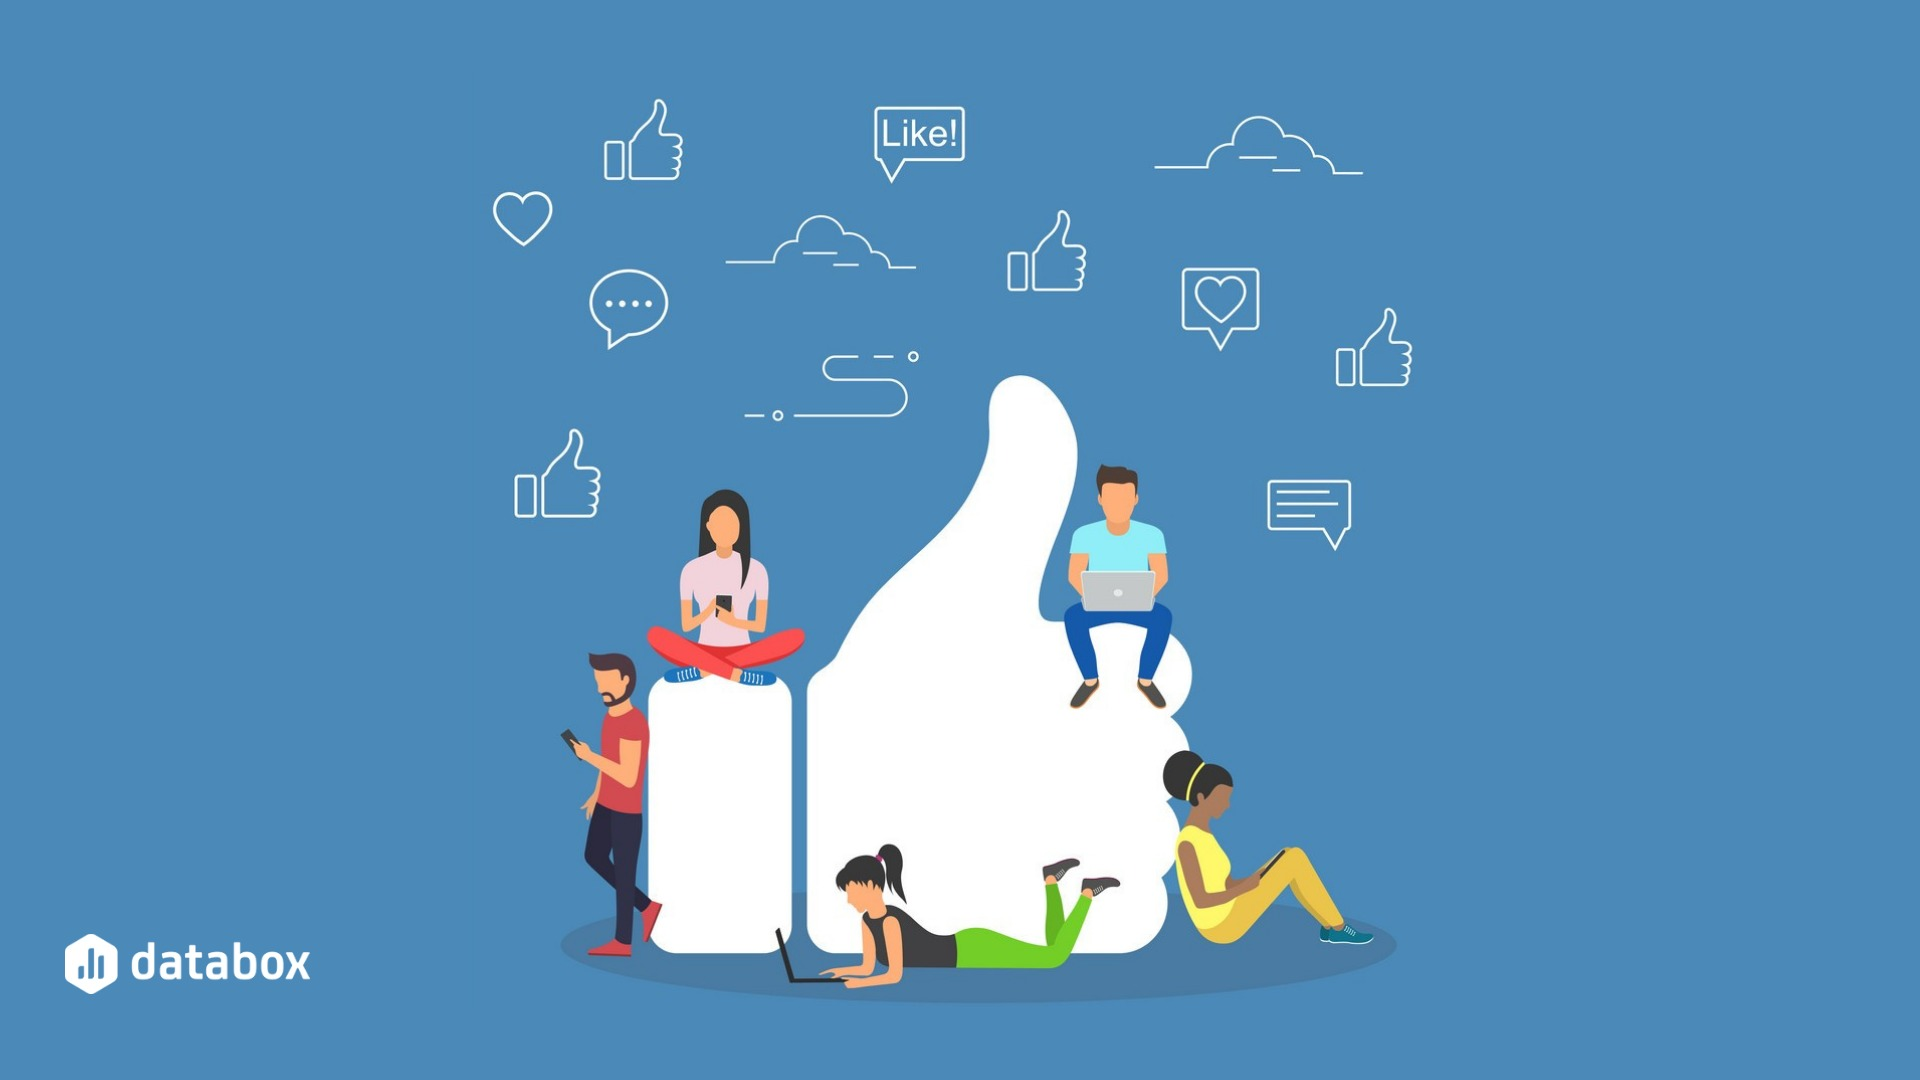 facebook-content-ideas.jpg